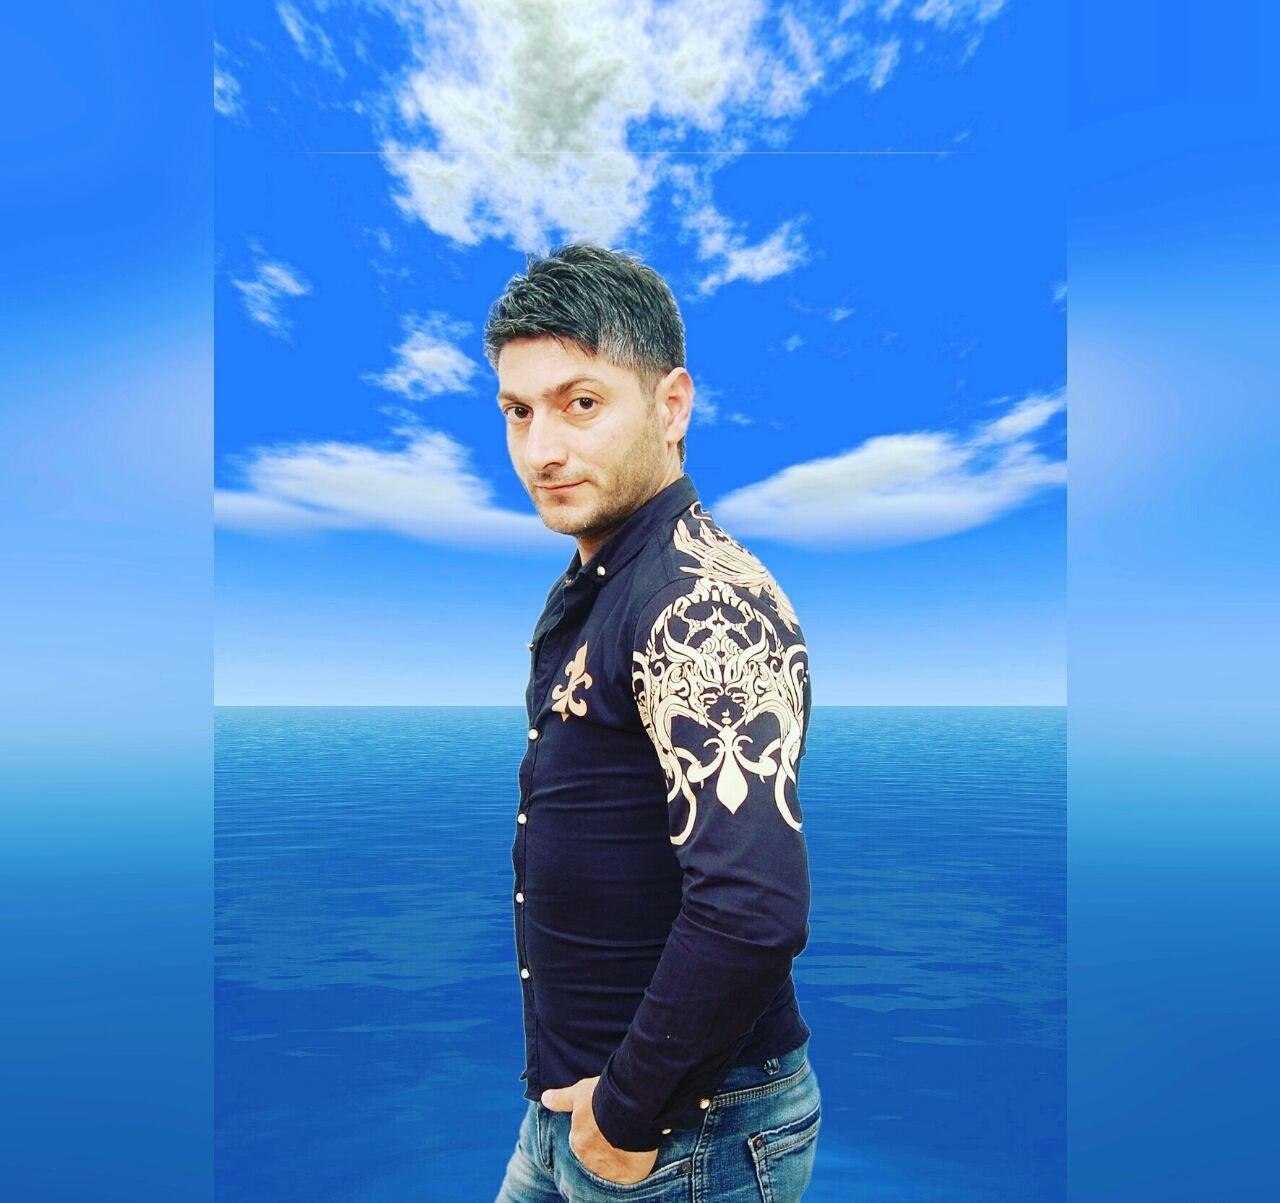 http://s8.picofile.com/file/8296630150/16Vuqar_Seda_Gulu_Solunca_Sevecem.jpg